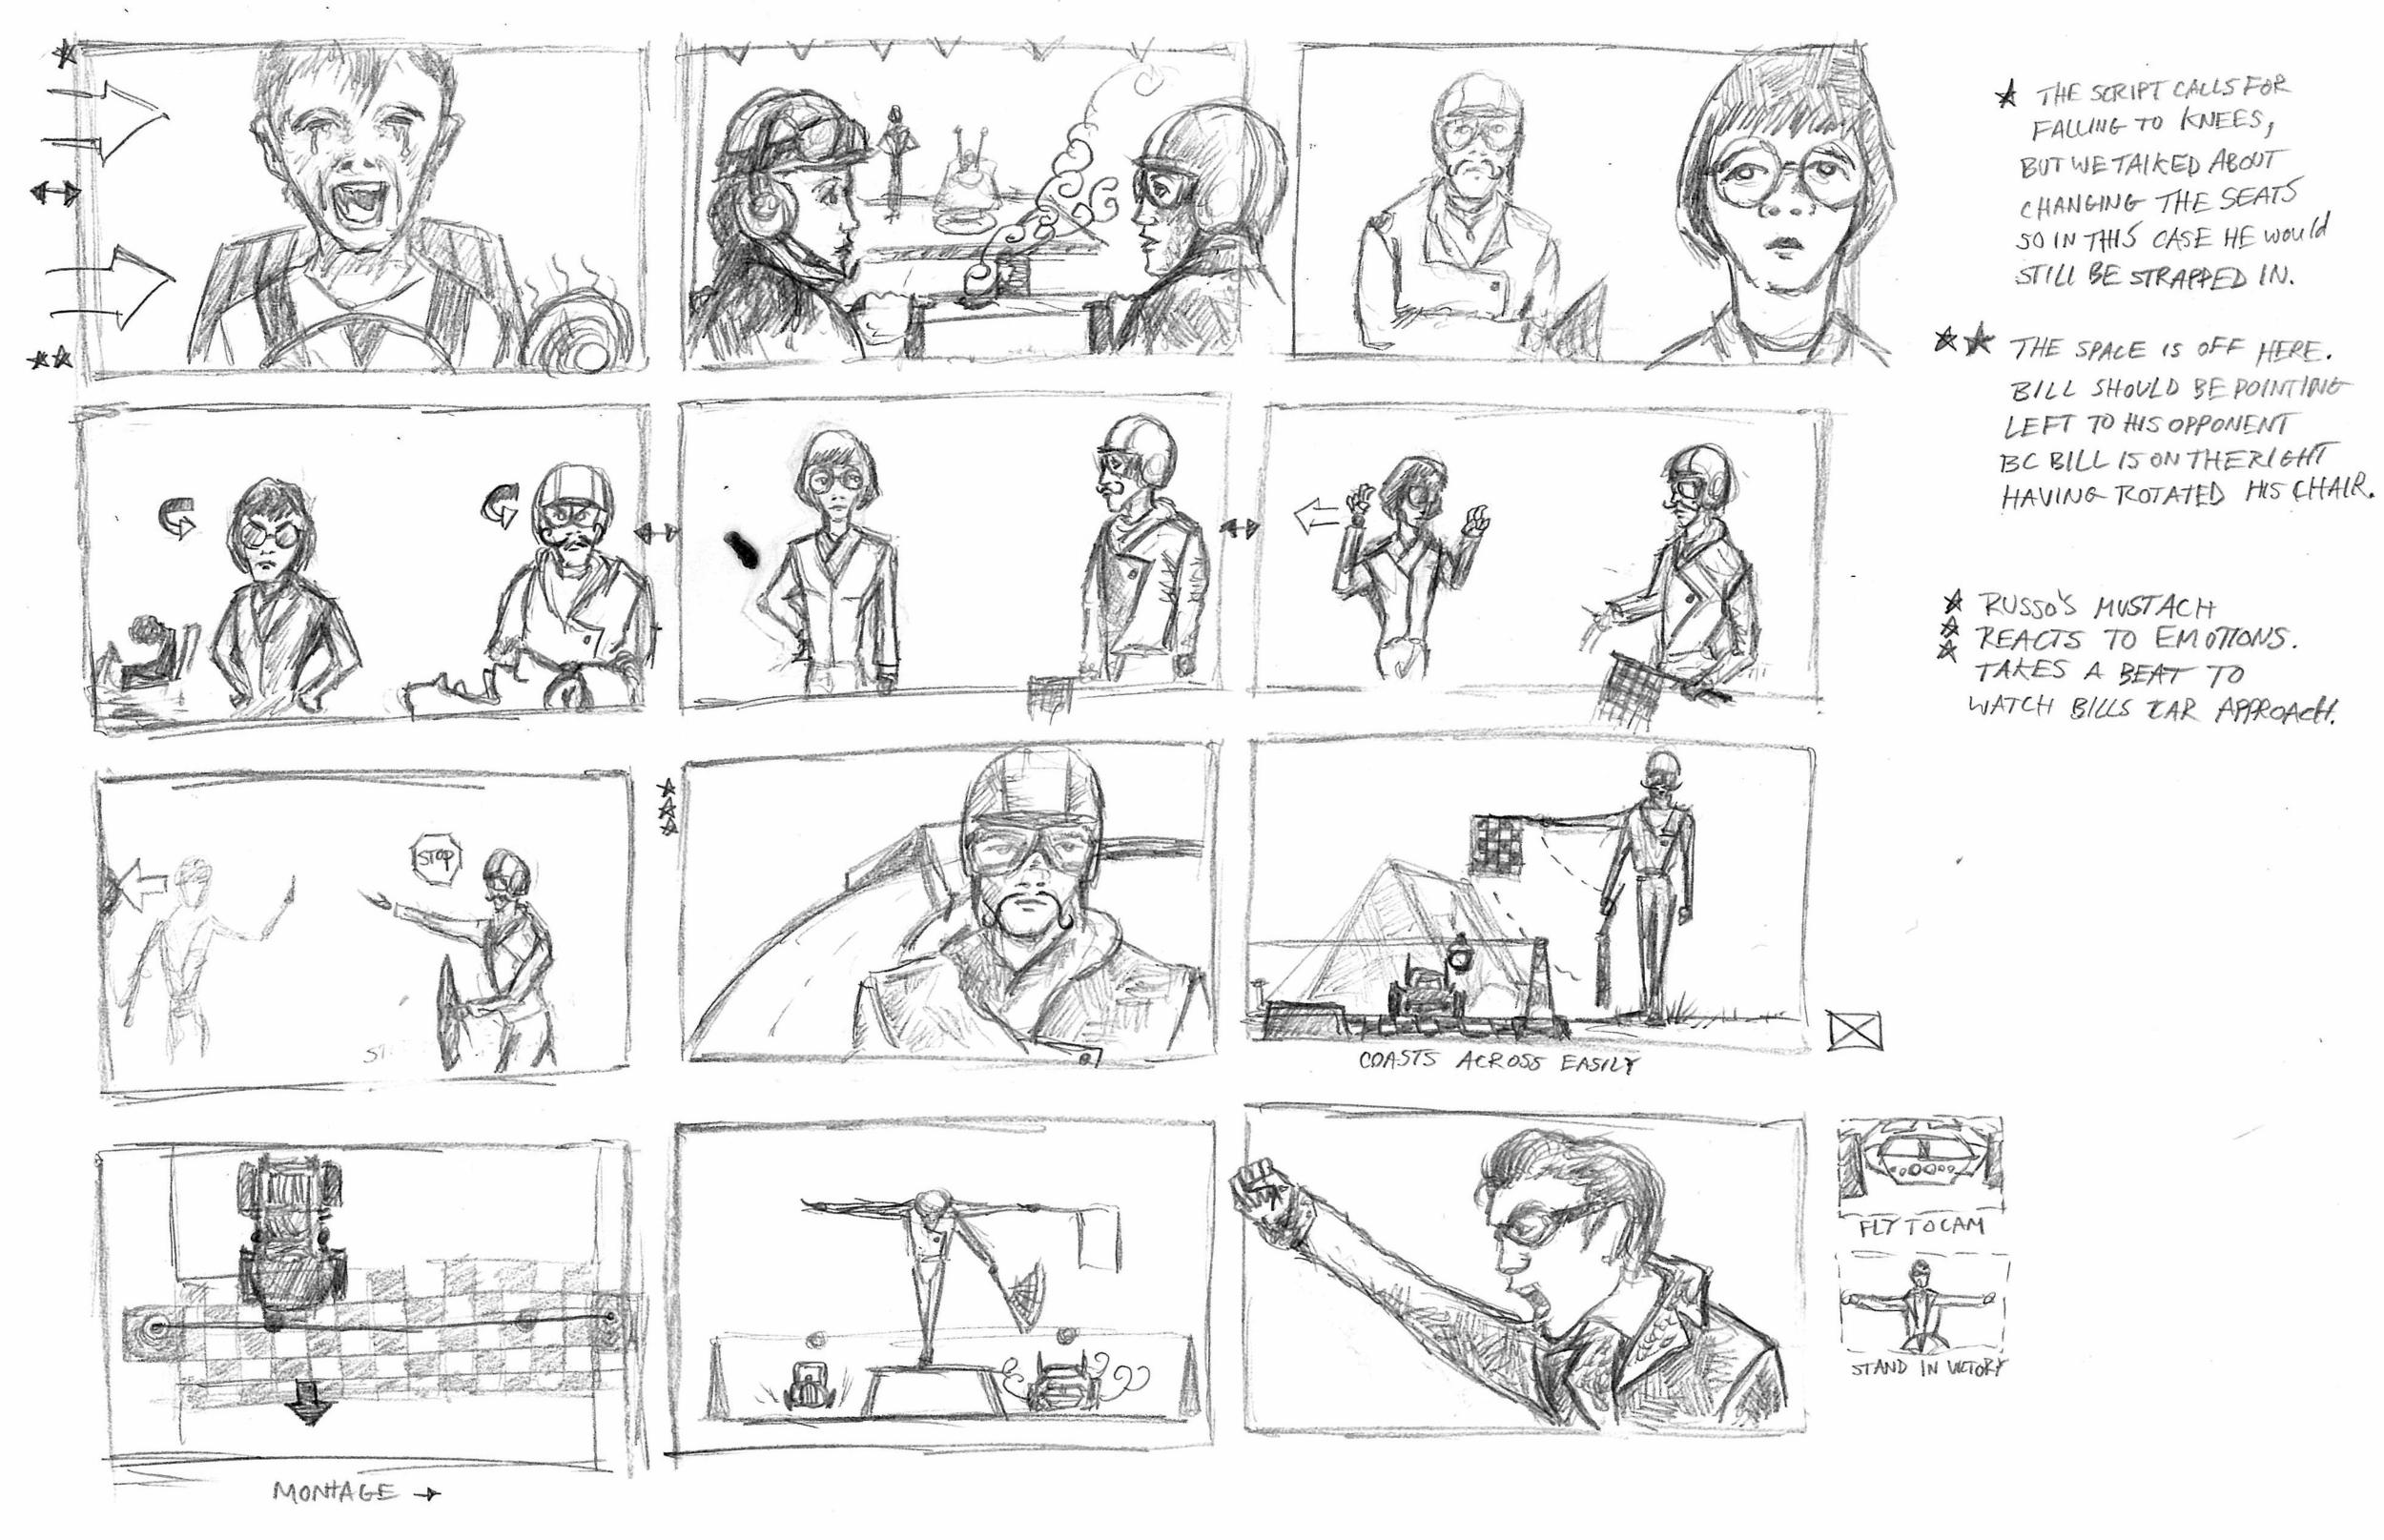 Prix Storyboard_PG008 - Film and TV - Jonathan B Perez - cREAtive Castle Studios.jpg